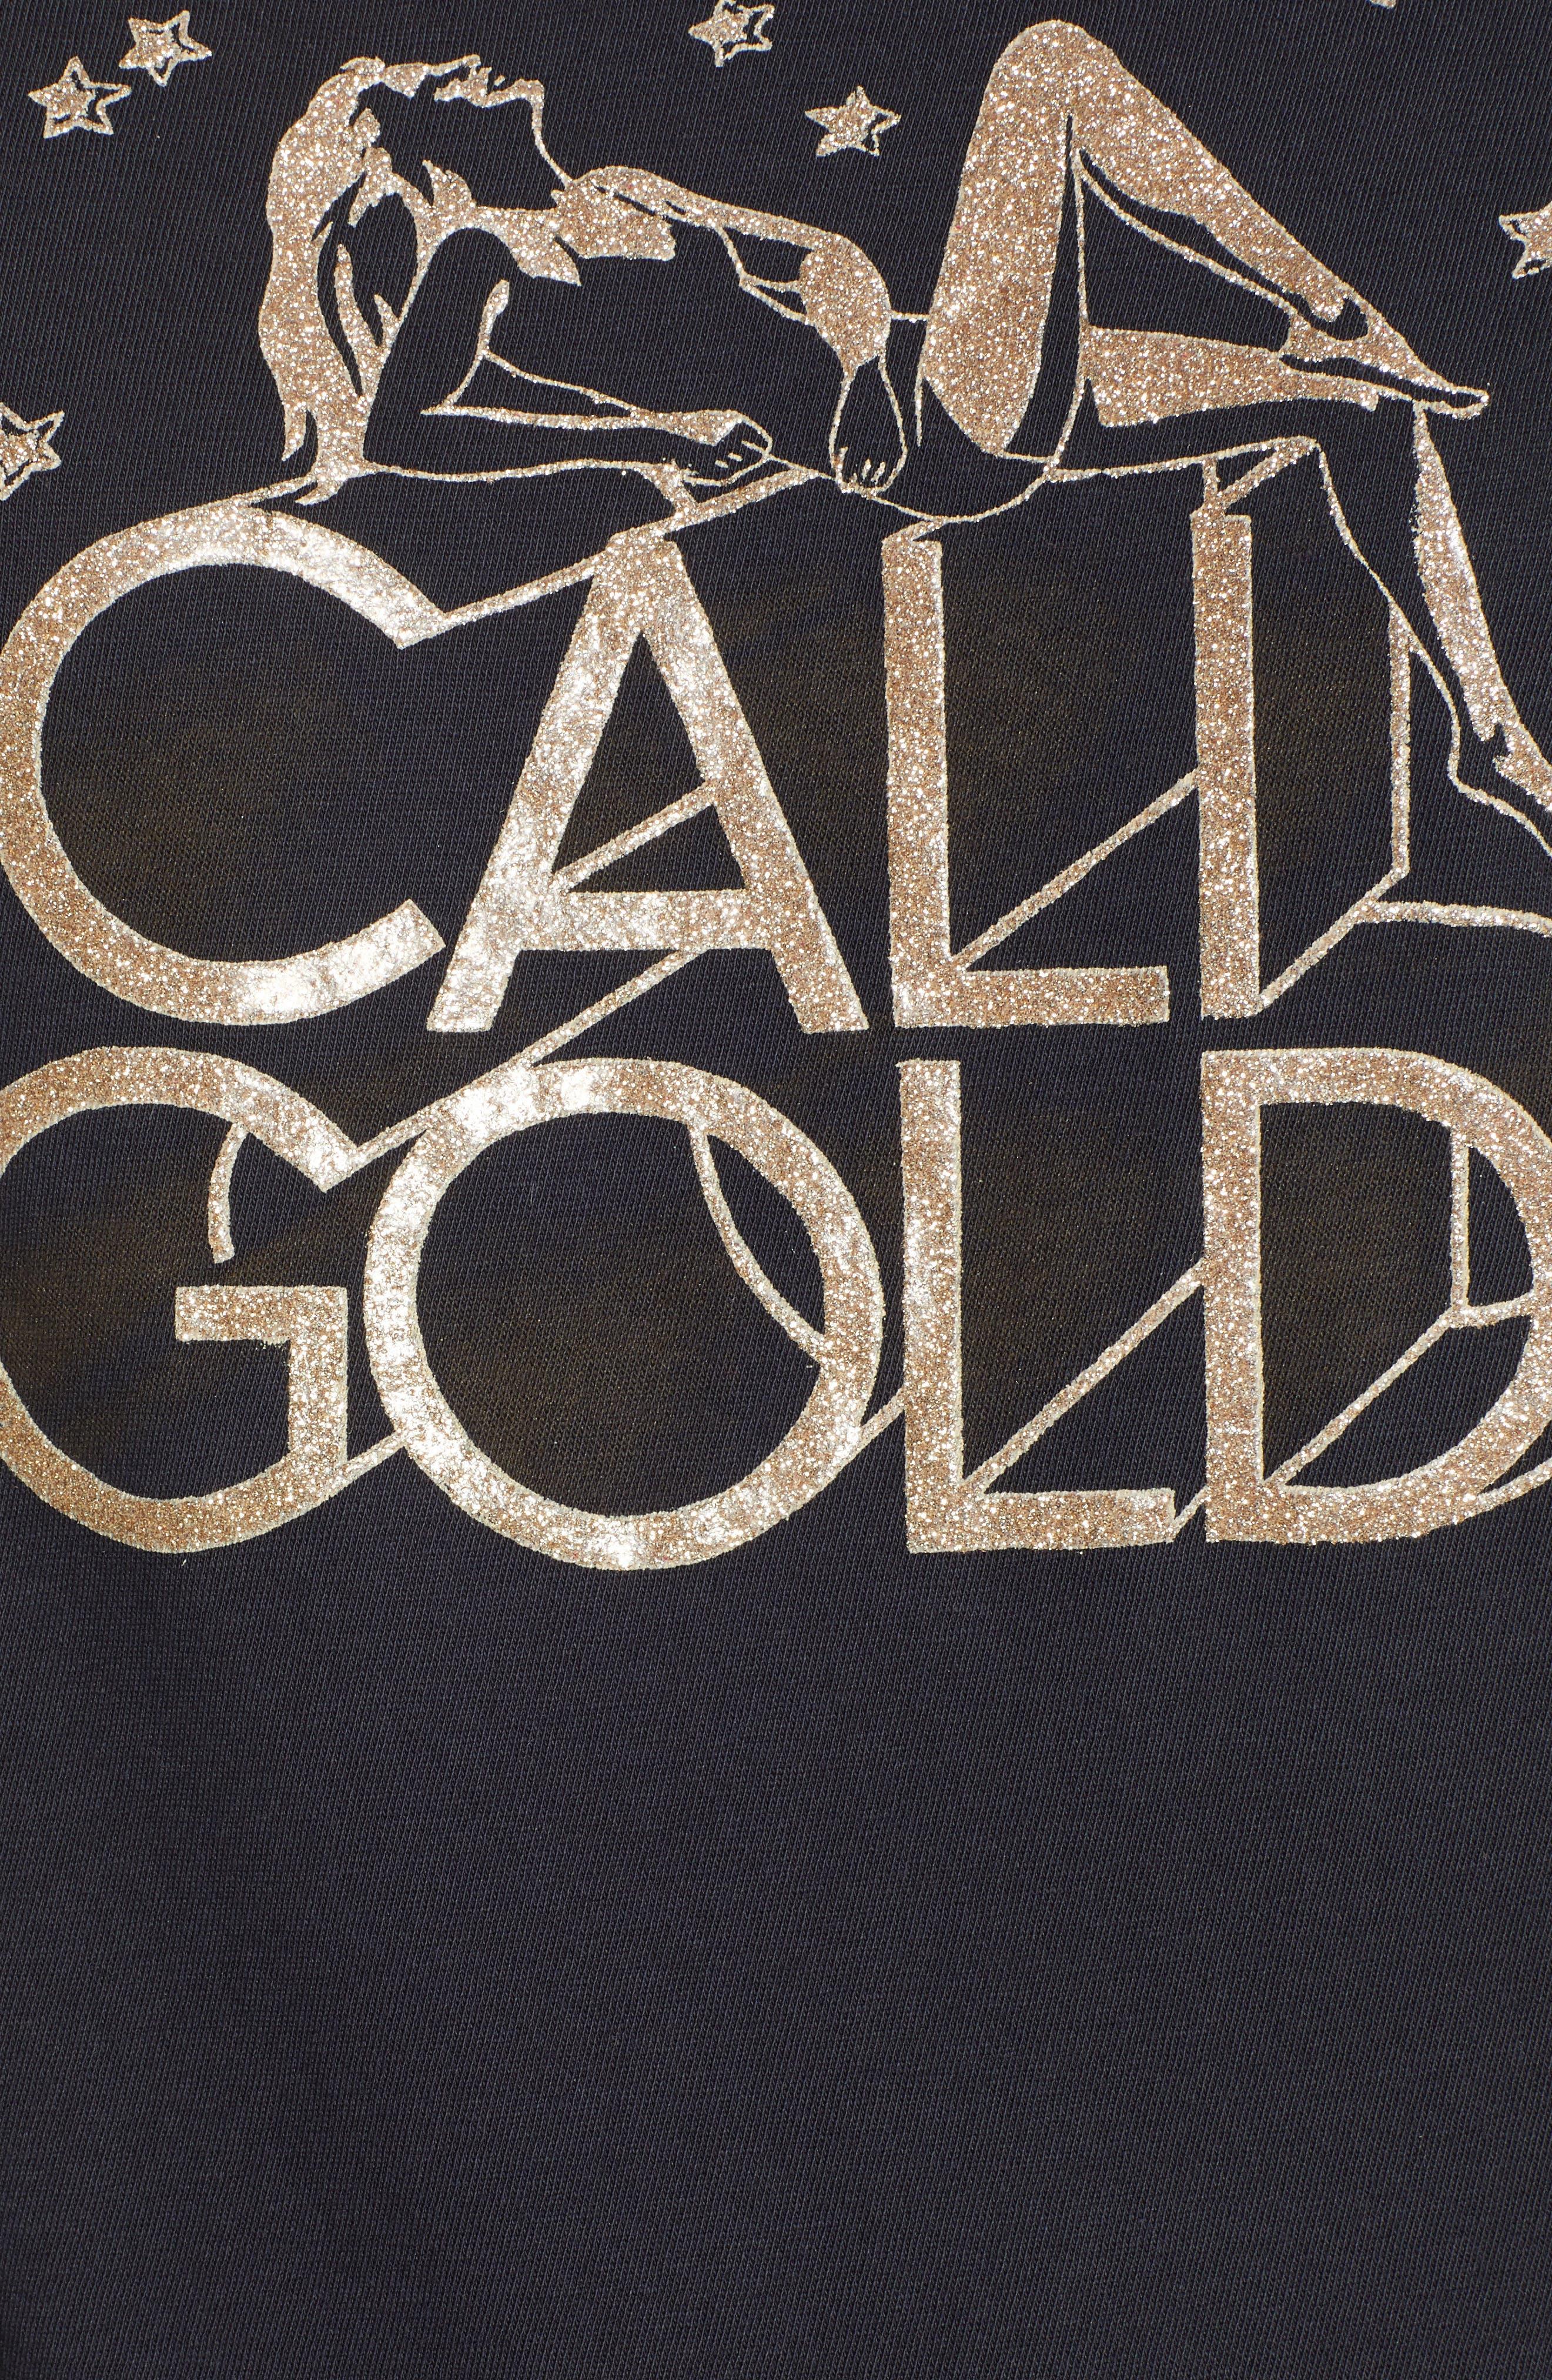 Cali Gold Tee,                             Alternate thumbnail 5, color,                             FADED BLACK